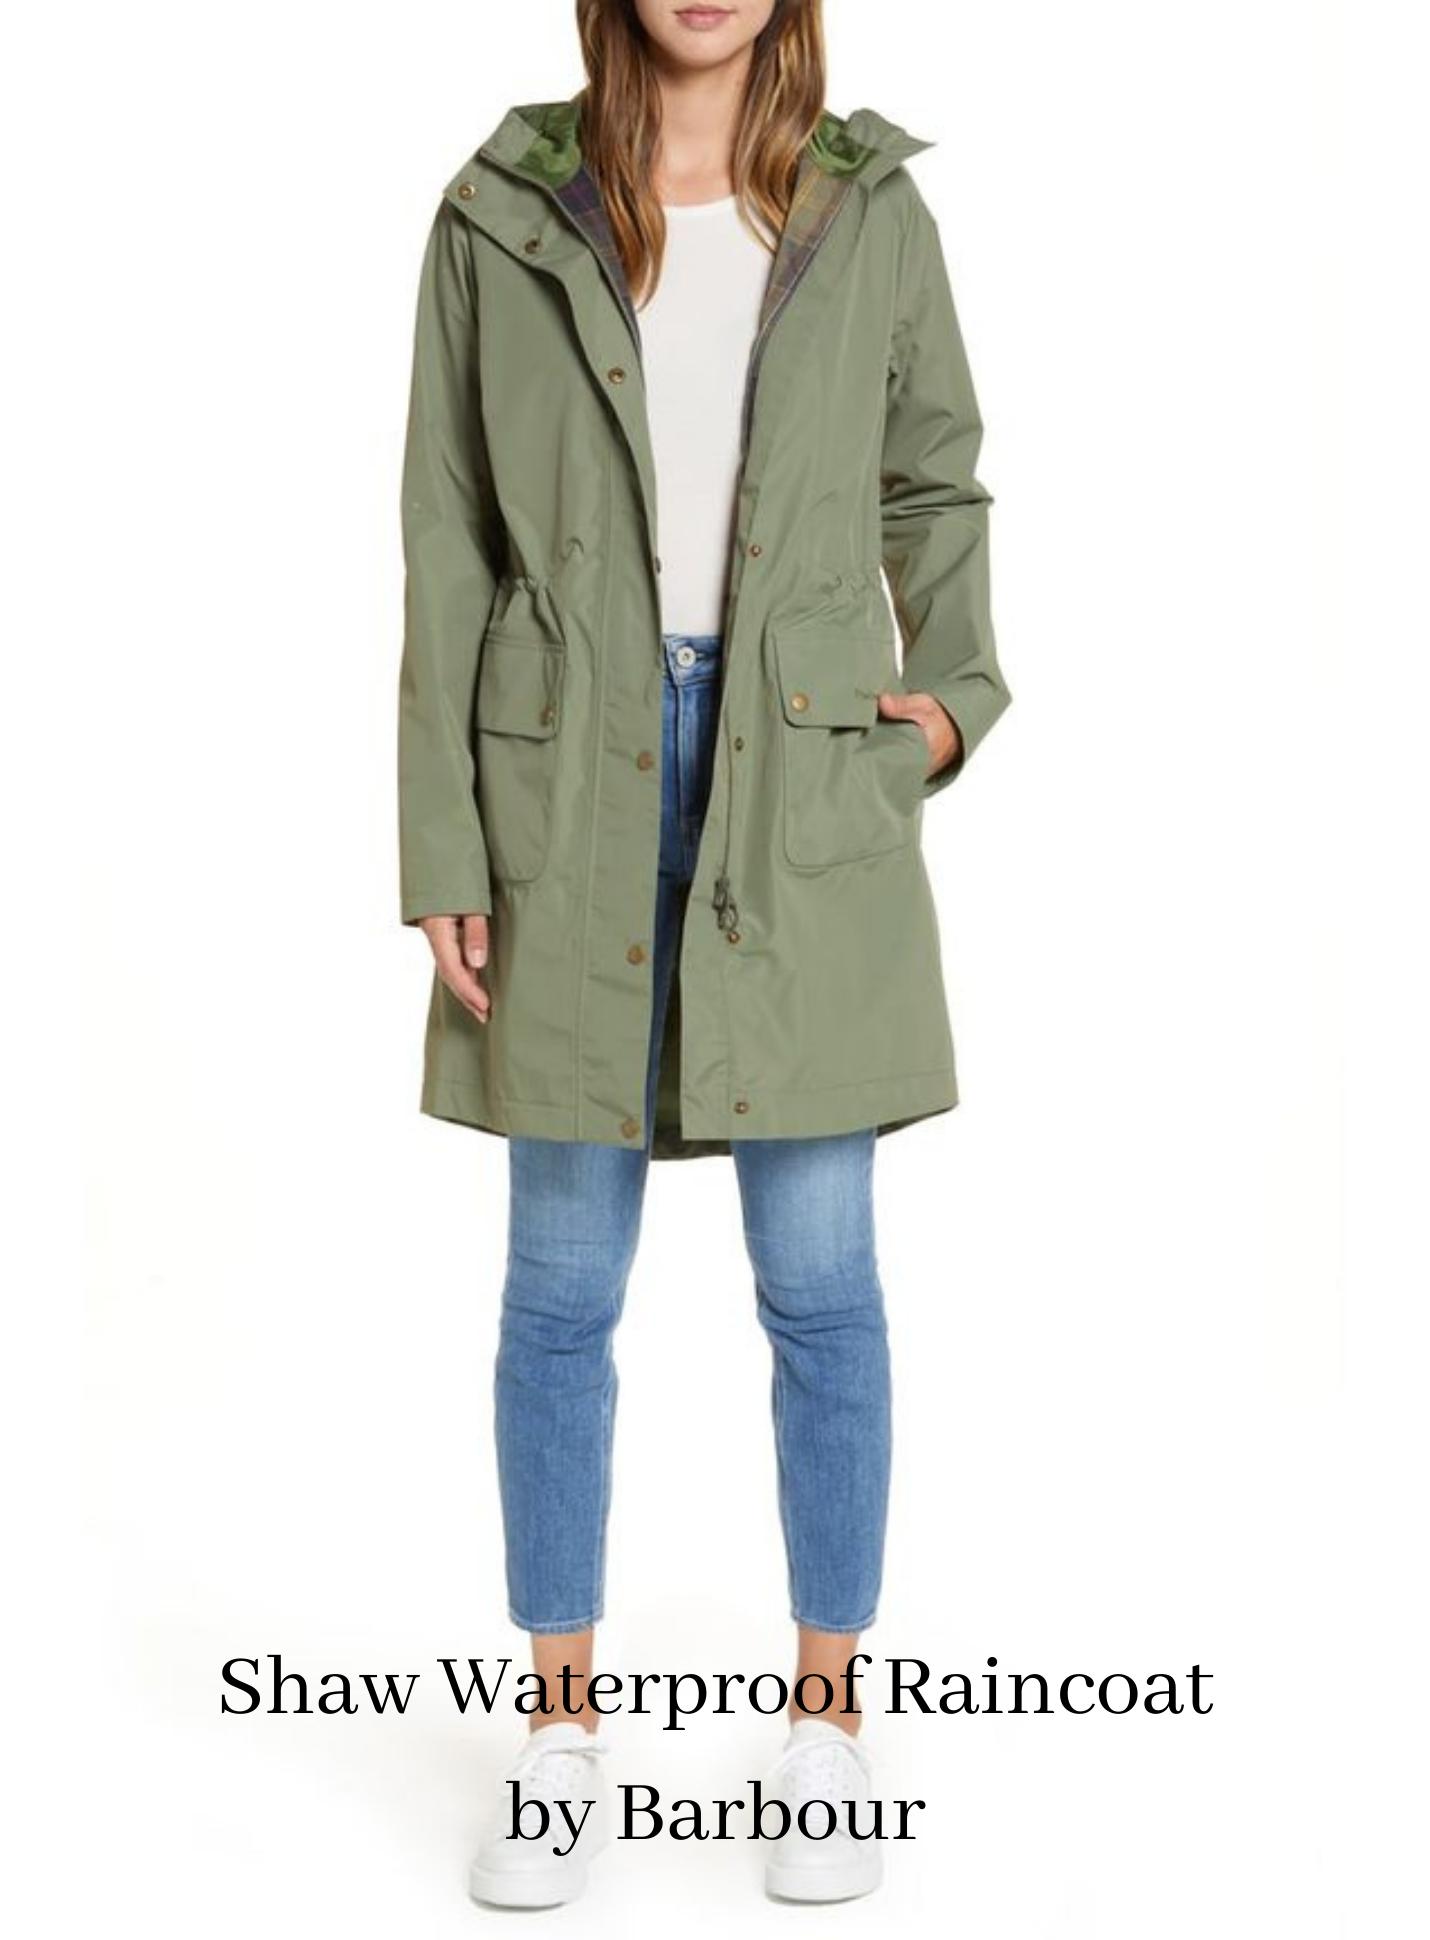 Shaw Waterproof Raincoat